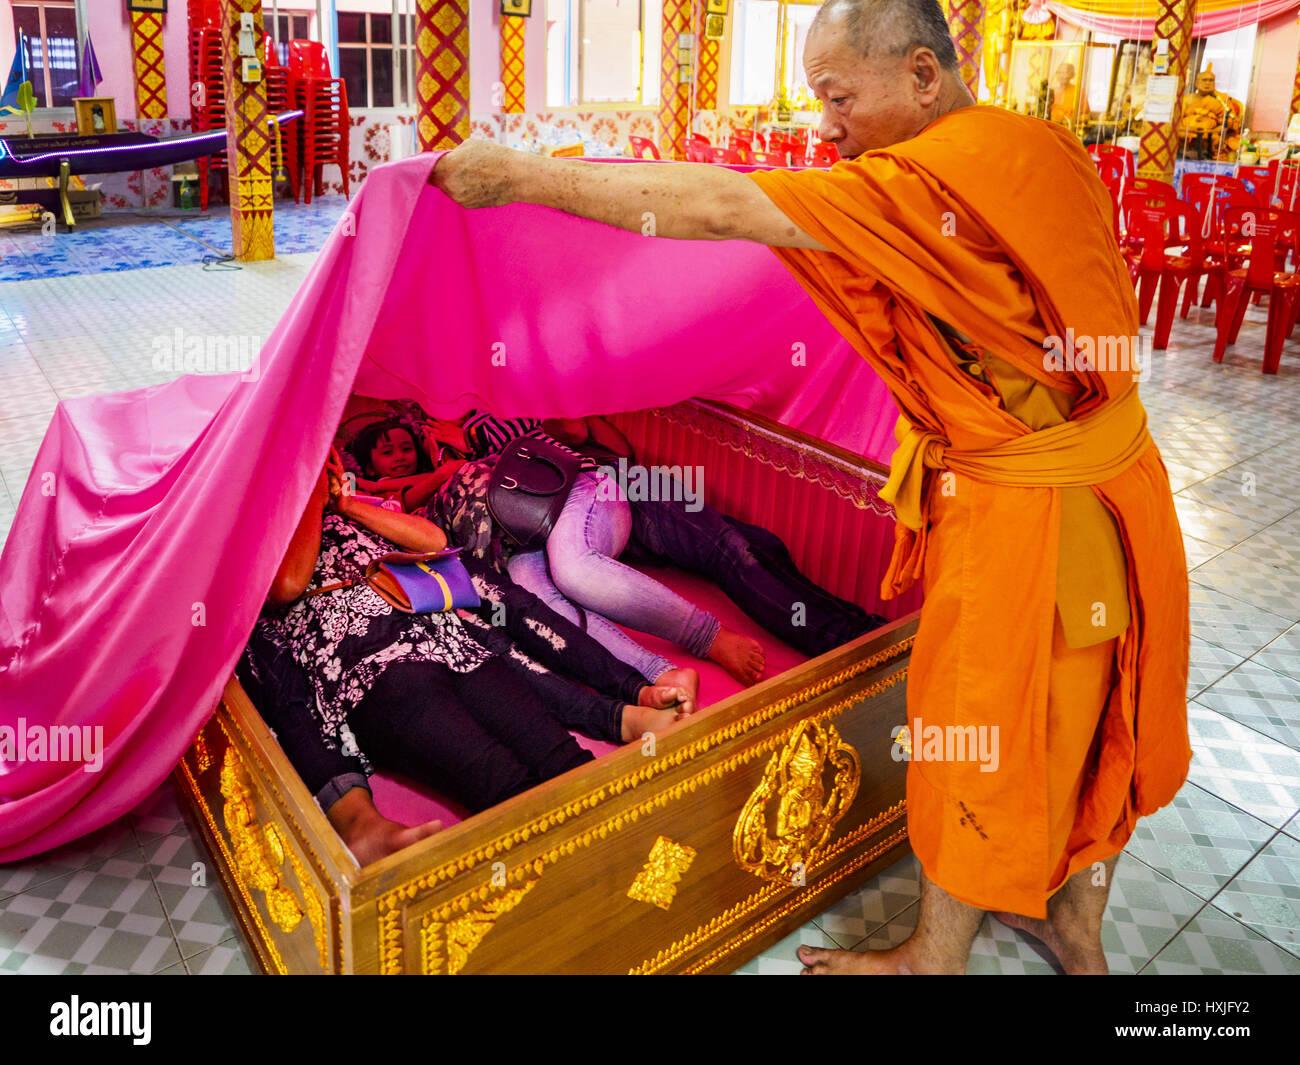 Bang Kruai, Nonthaburi, Tailandia. 29 Mar, 2017. Un monje budista extrae una hoja rosa más de una familia en Imagen De Stock